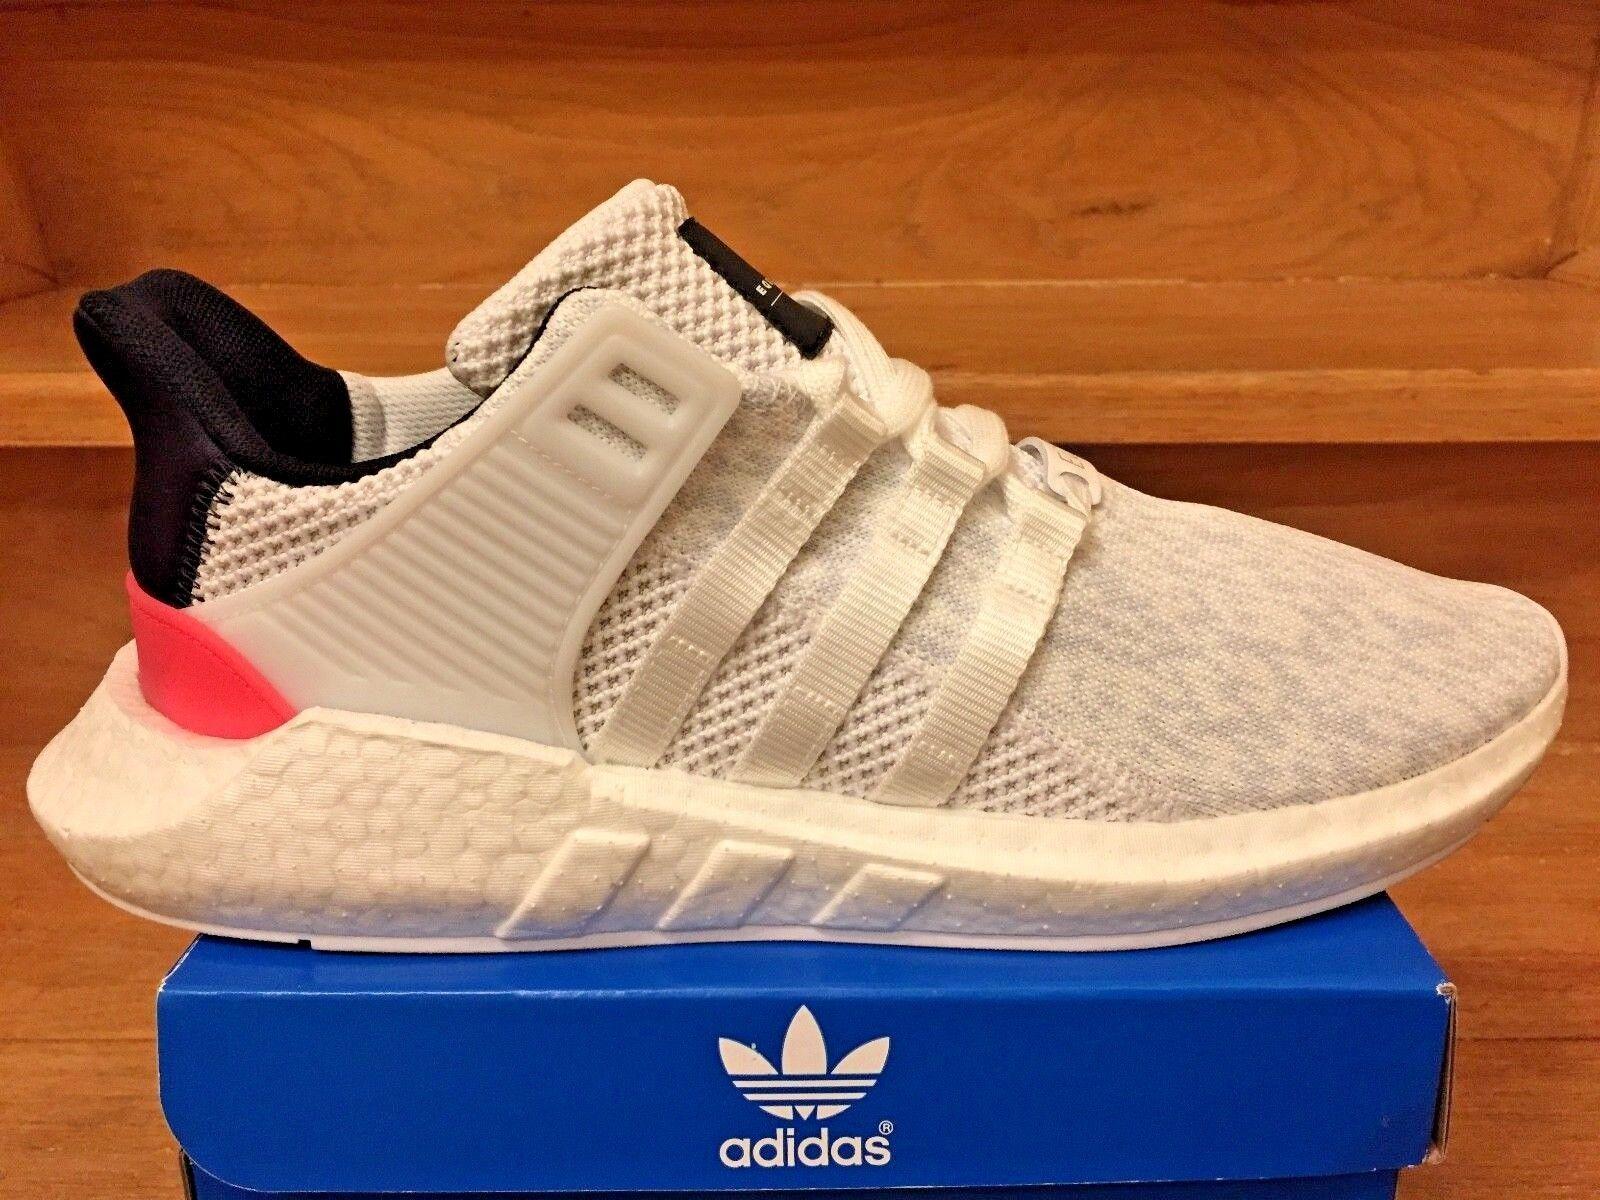 Adidas EQT Support 93/17 Boost